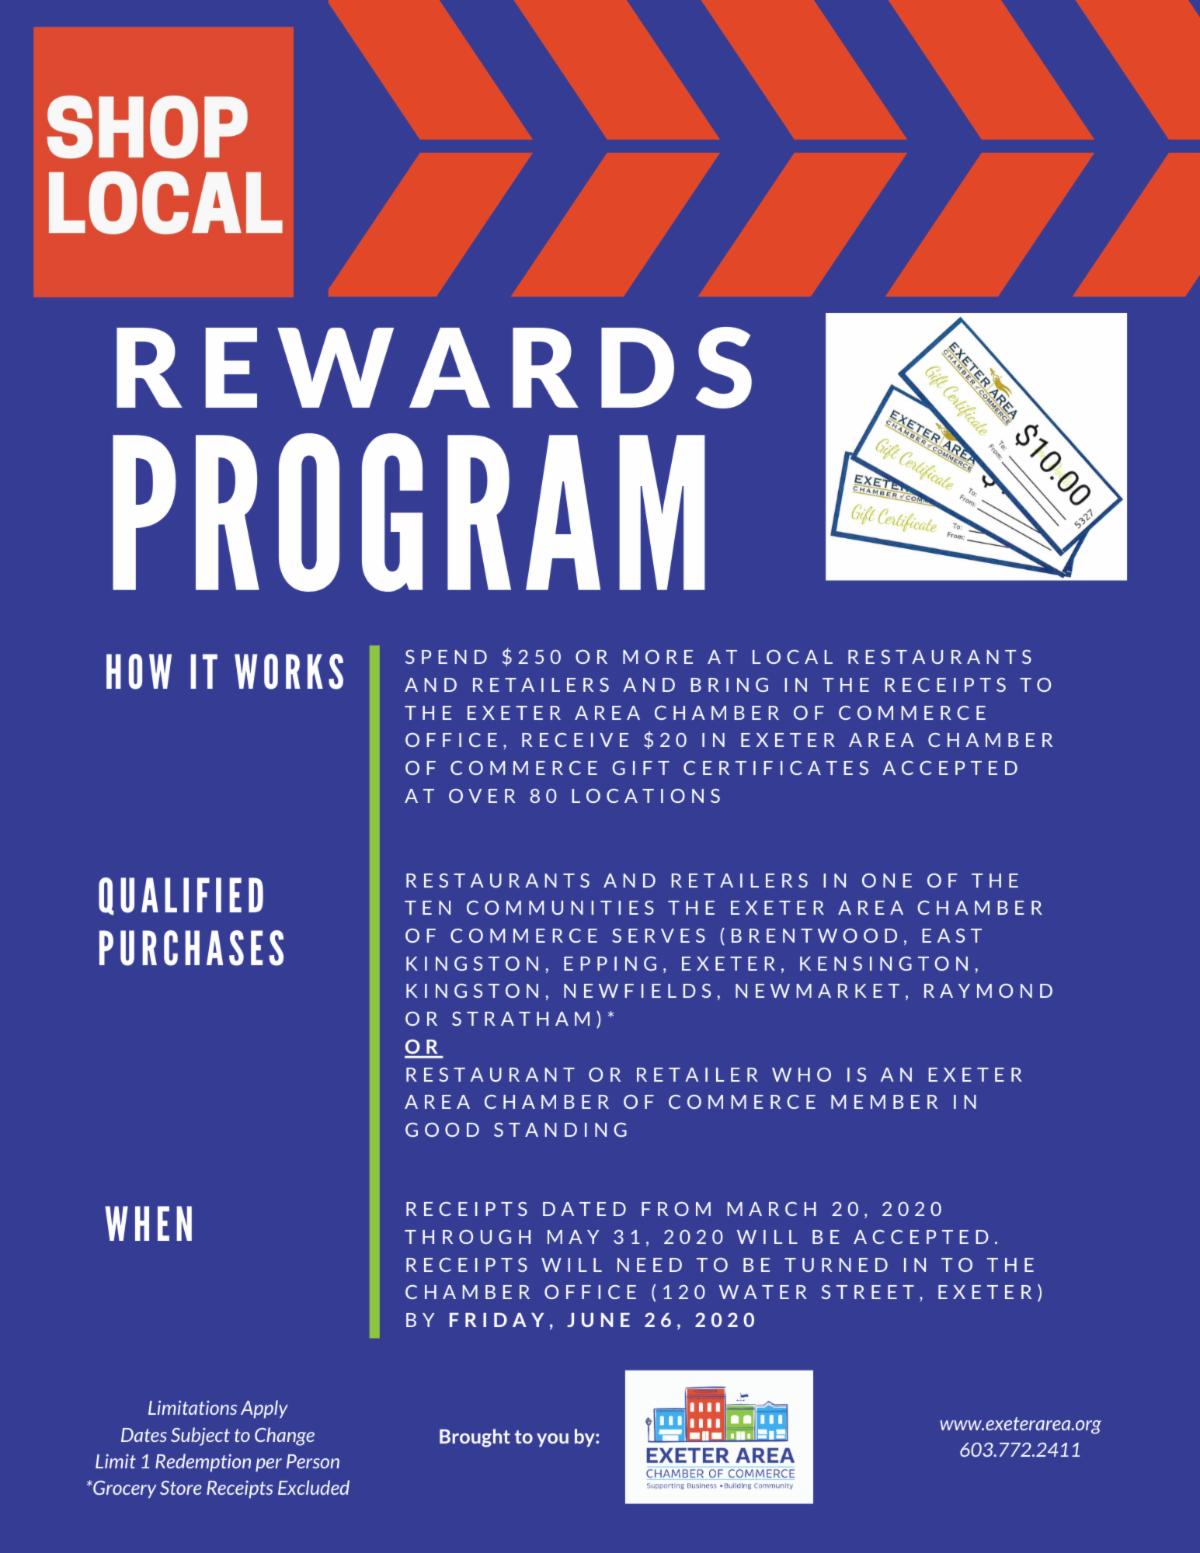 Shop Local Rewards Program